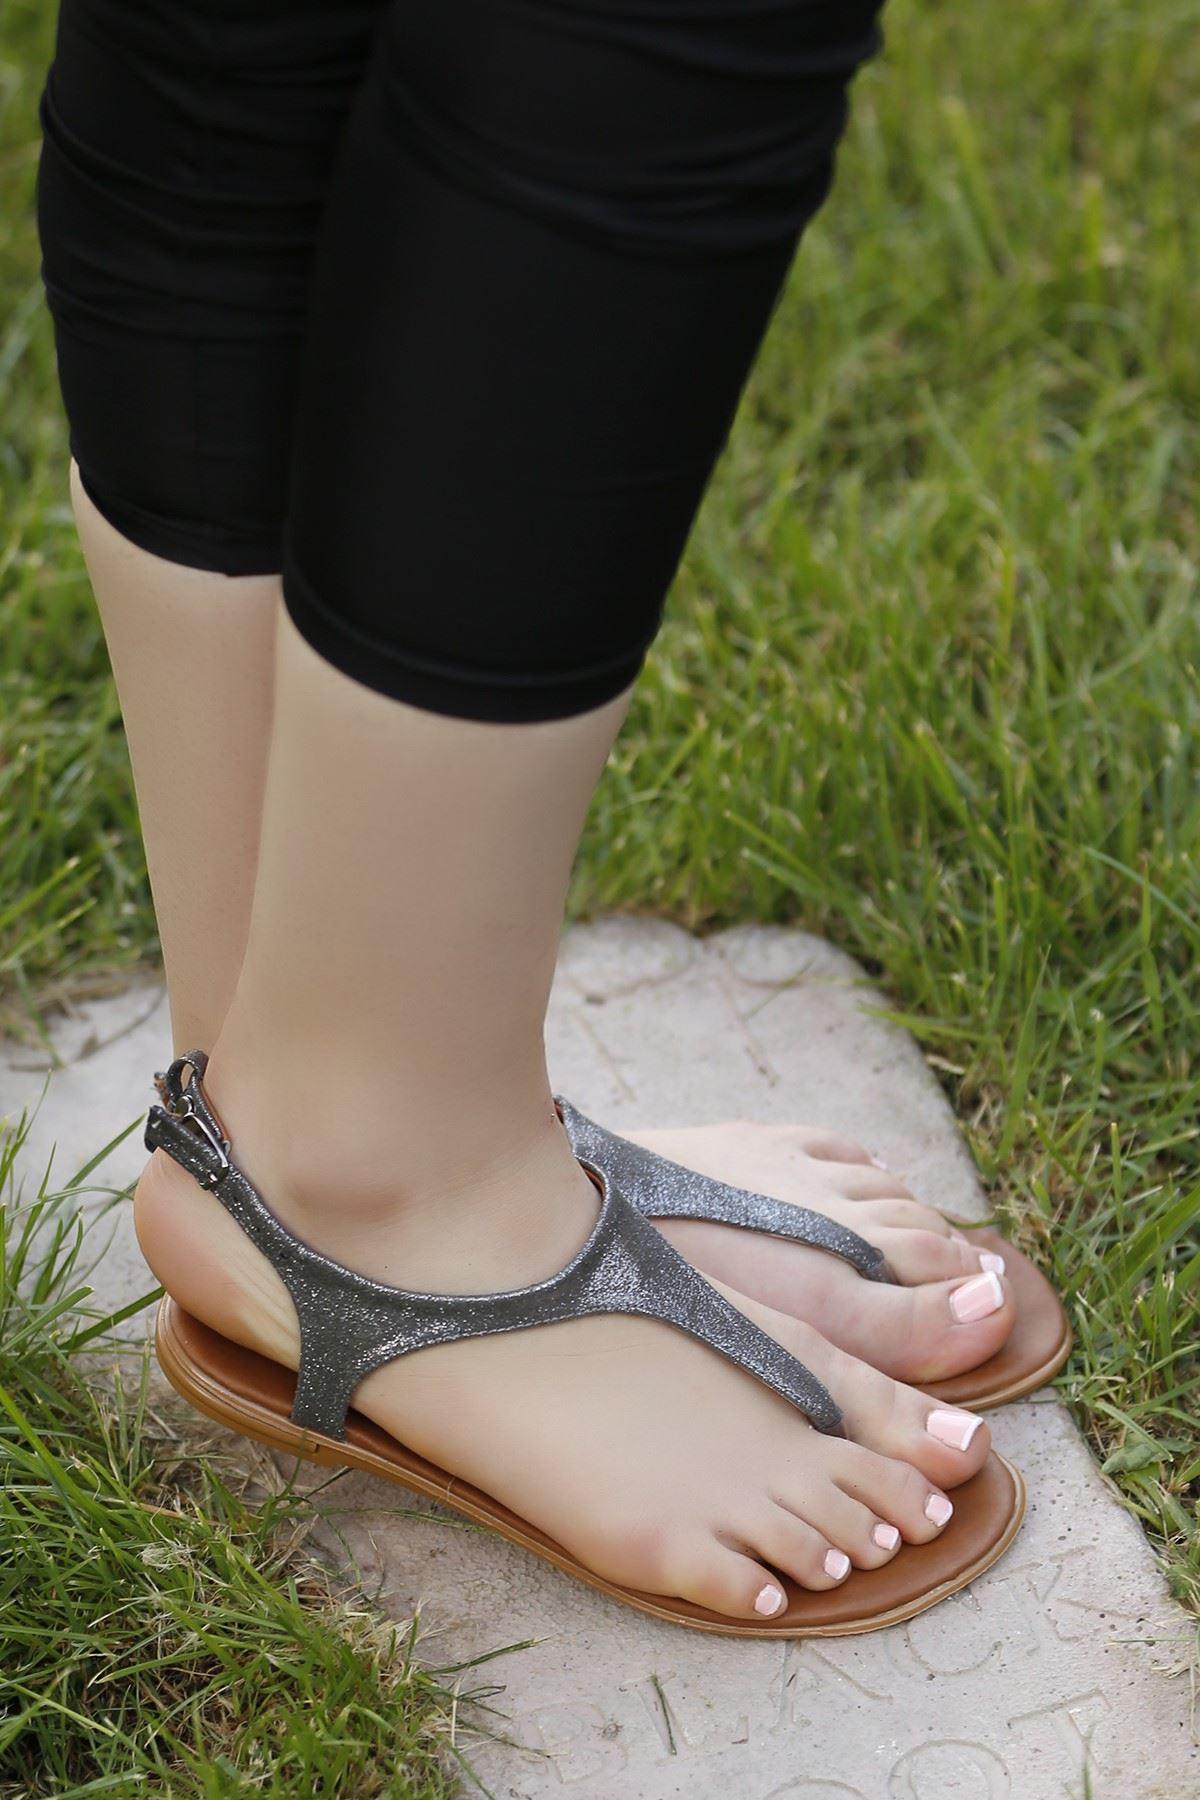 Parmak Arası Sandalet Simlifüme - 4194.264.